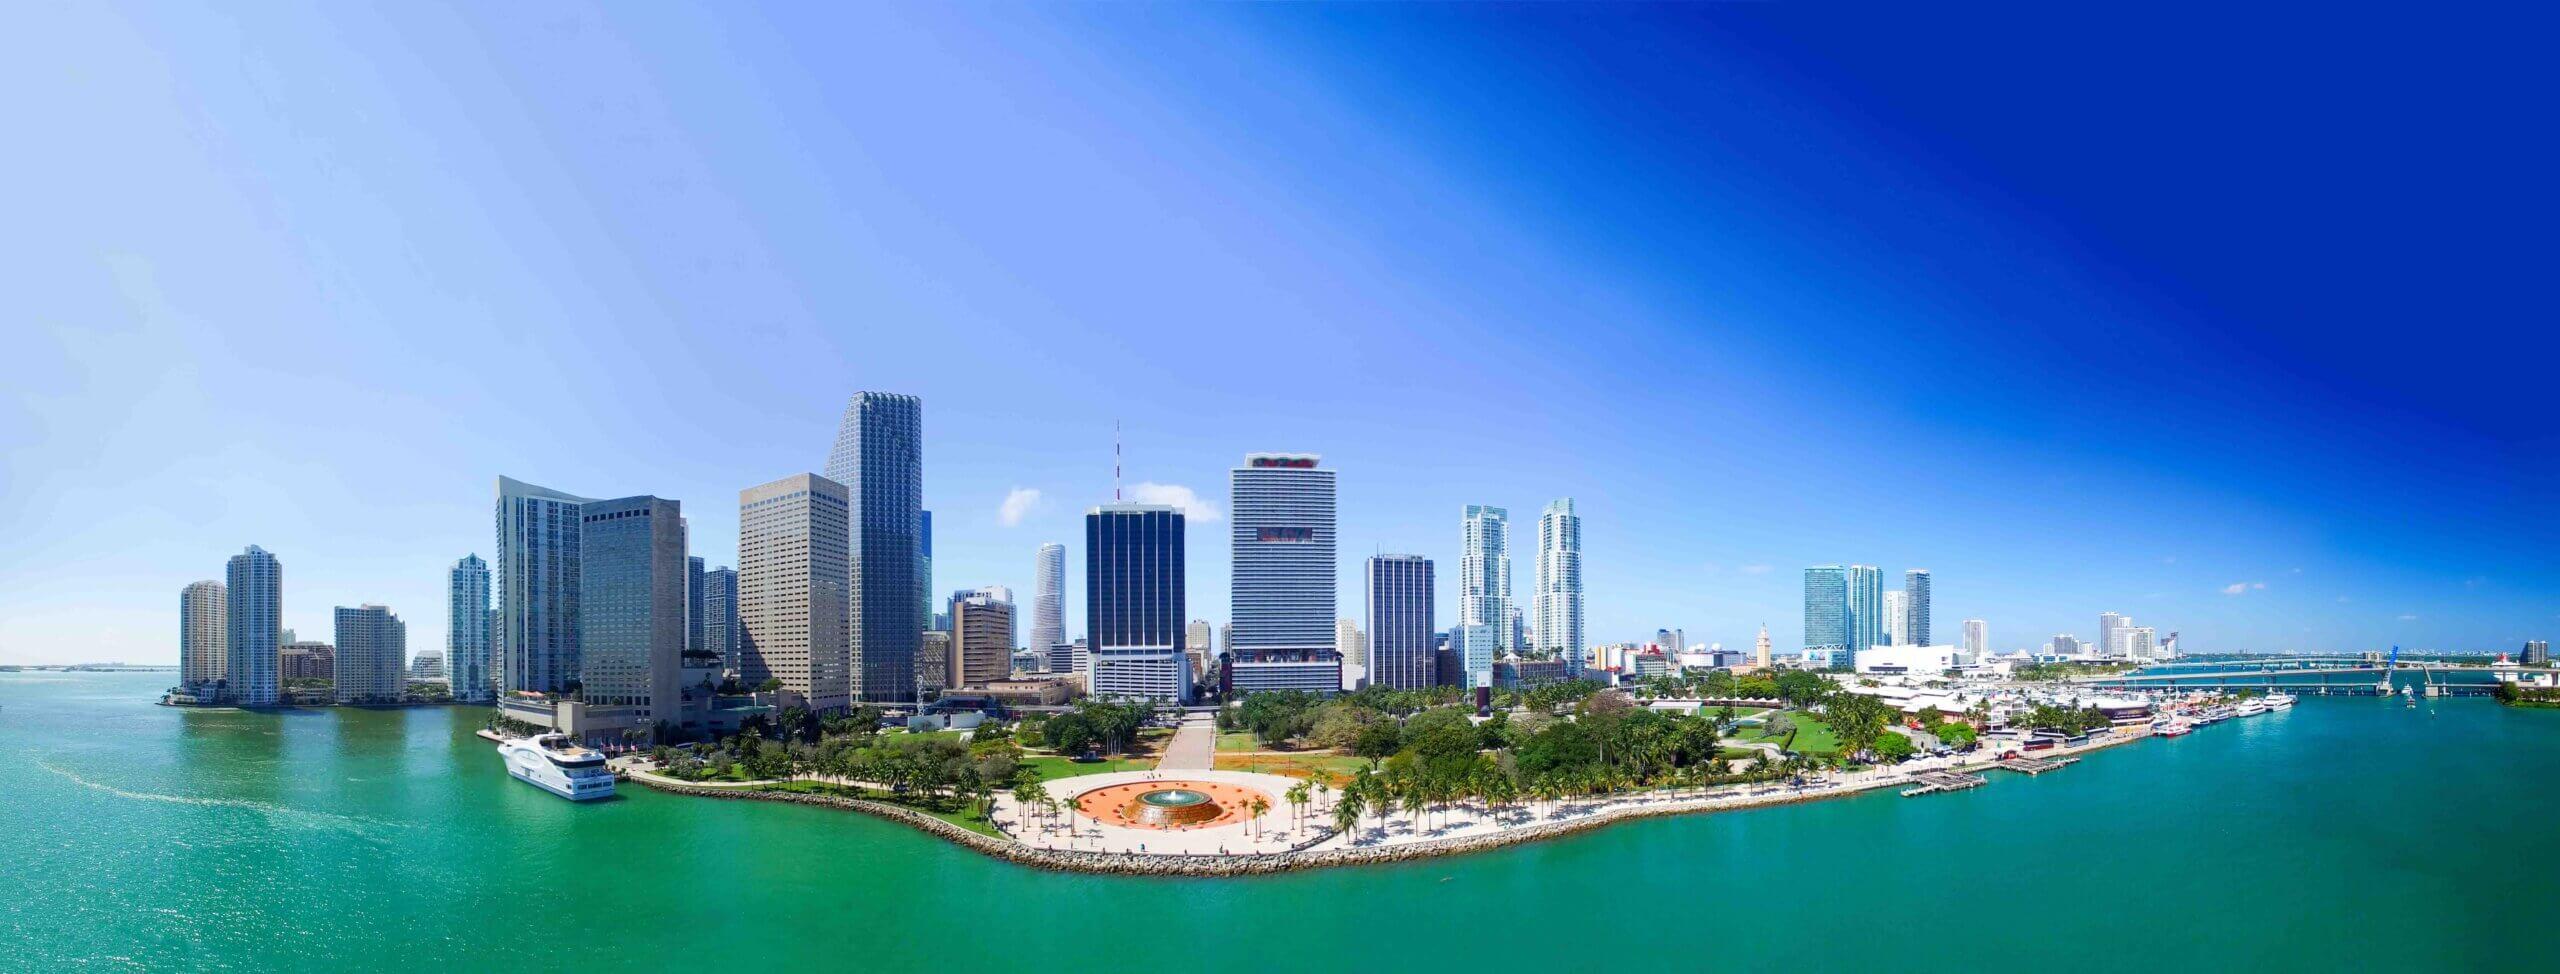 Verenigde Staten Miami